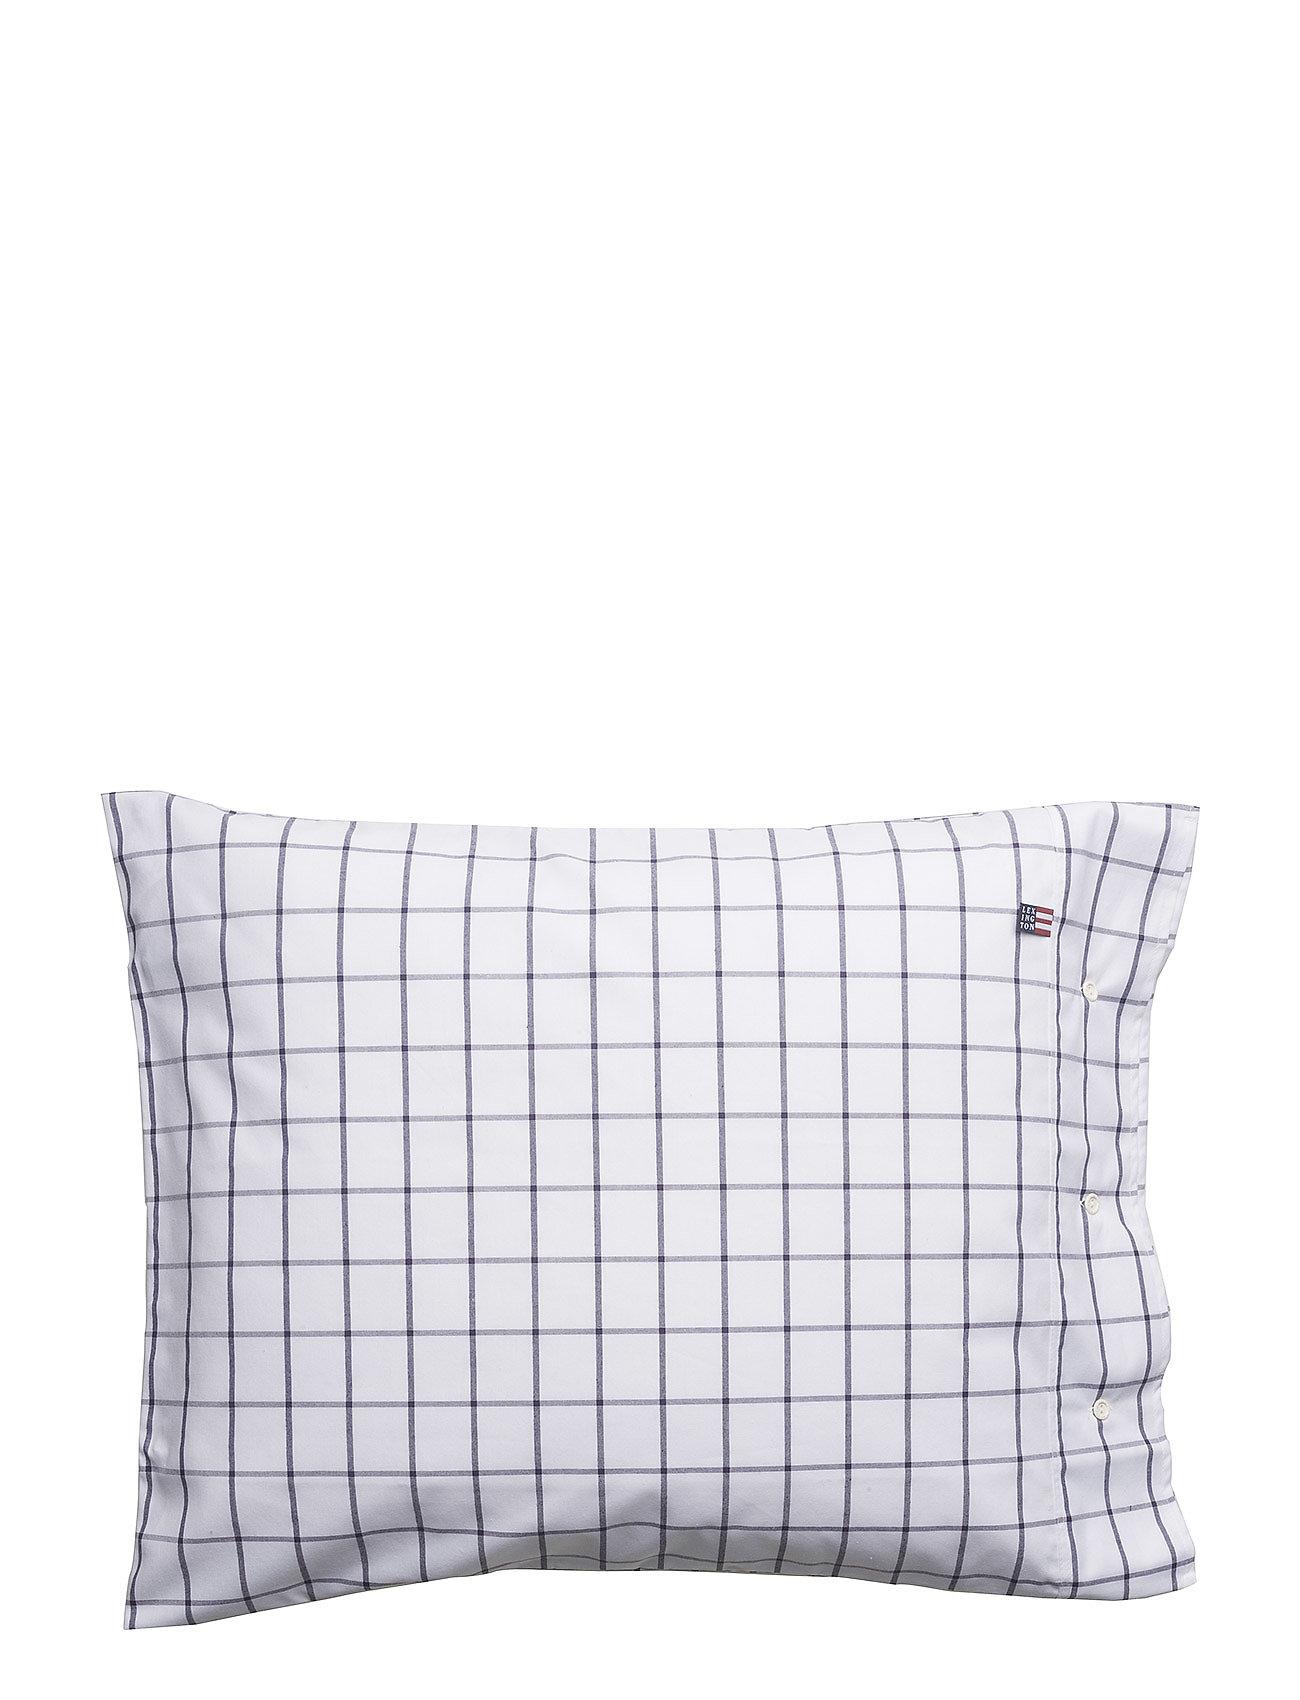 Lexington Home Pin Point Shaker Navy Pillowcase - NAVY/WHITE